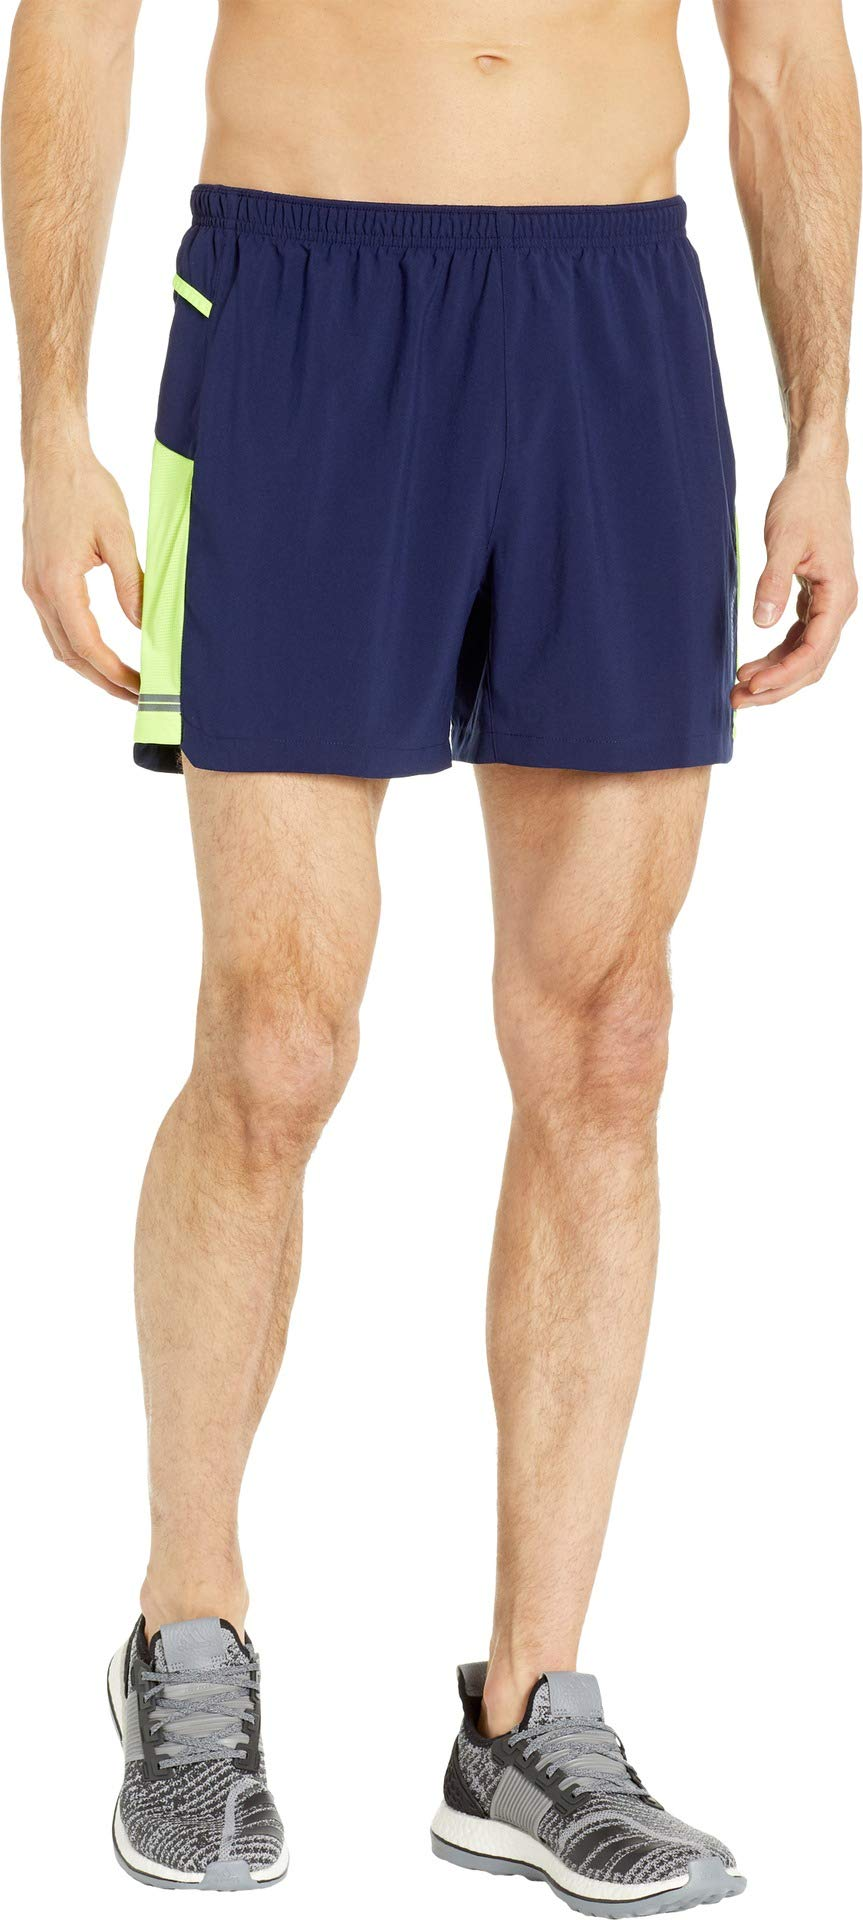 Brooks Men's Sherpa 5'' Shorts Navy/Nightlife Medium 5